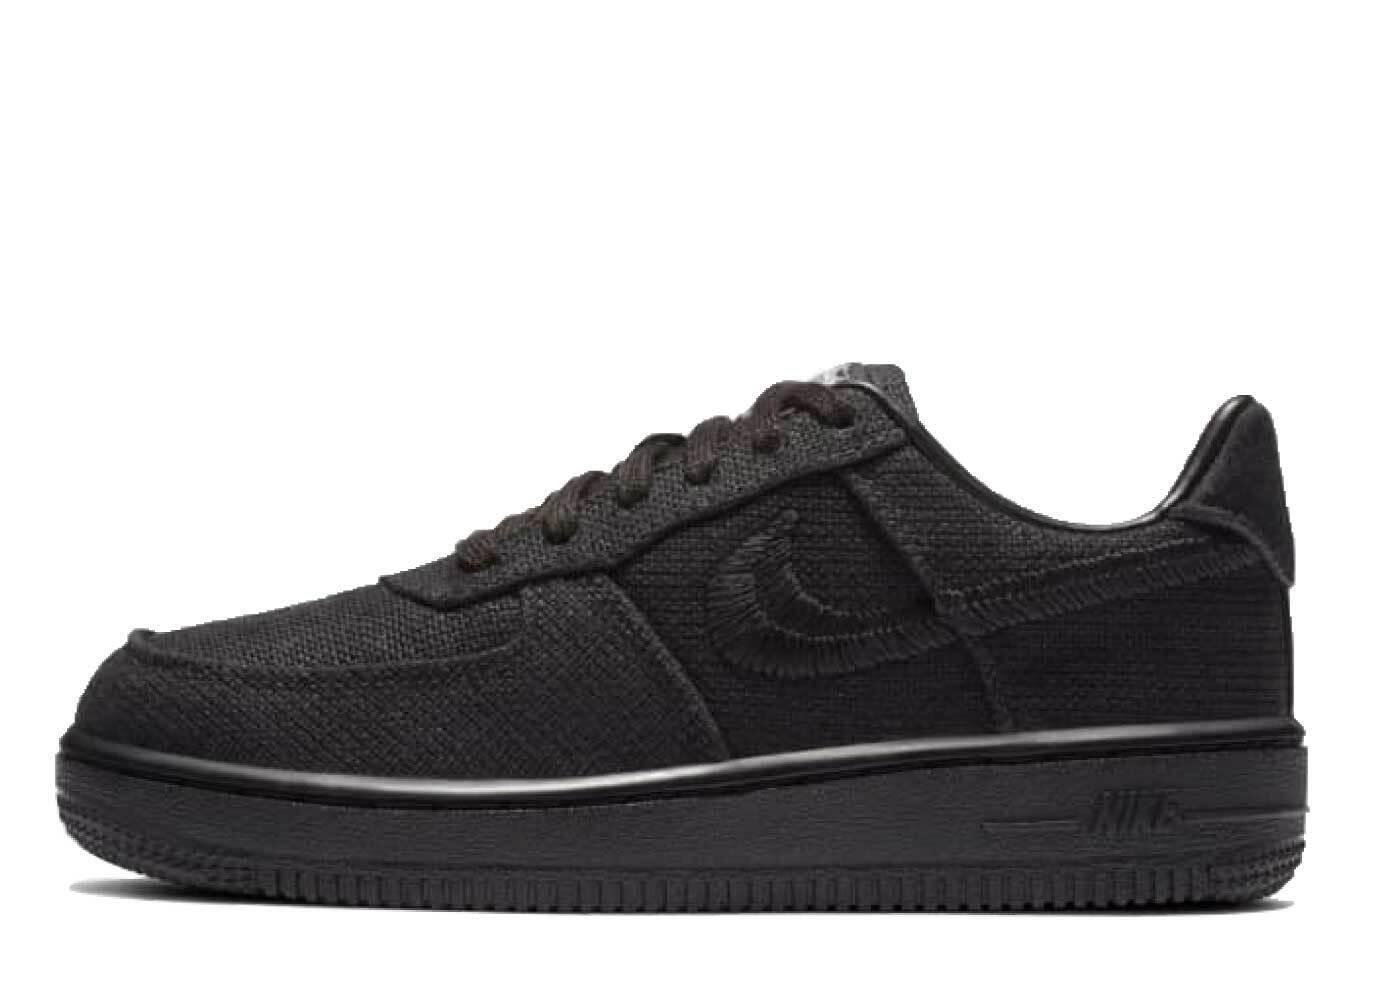 Stussy × Nike Air Force 1 Low Black PSの写真